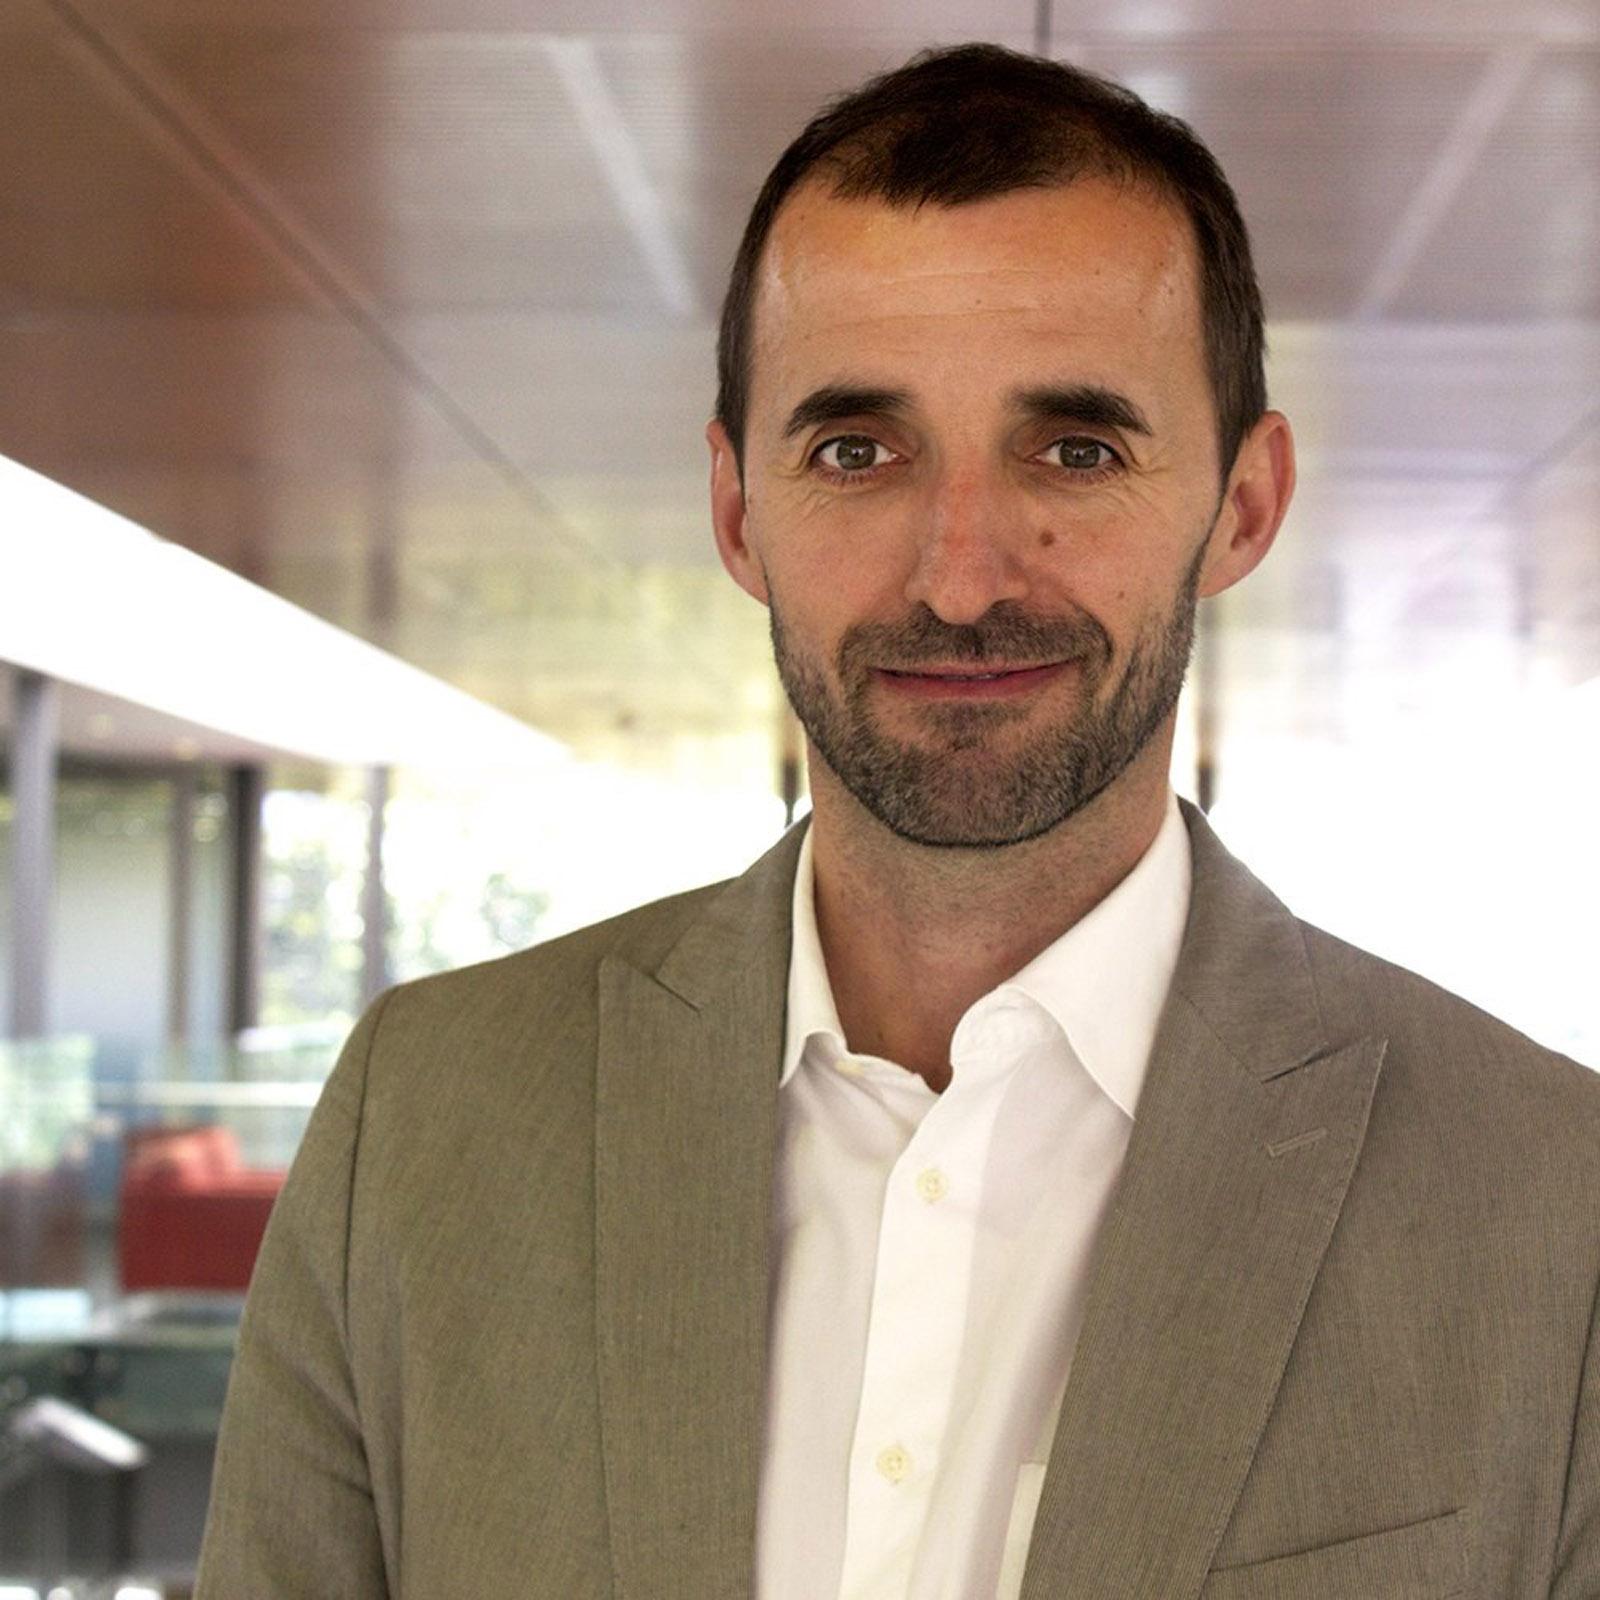 Director of International Affairs at the British Film Institute (BFI), Neil Peplow